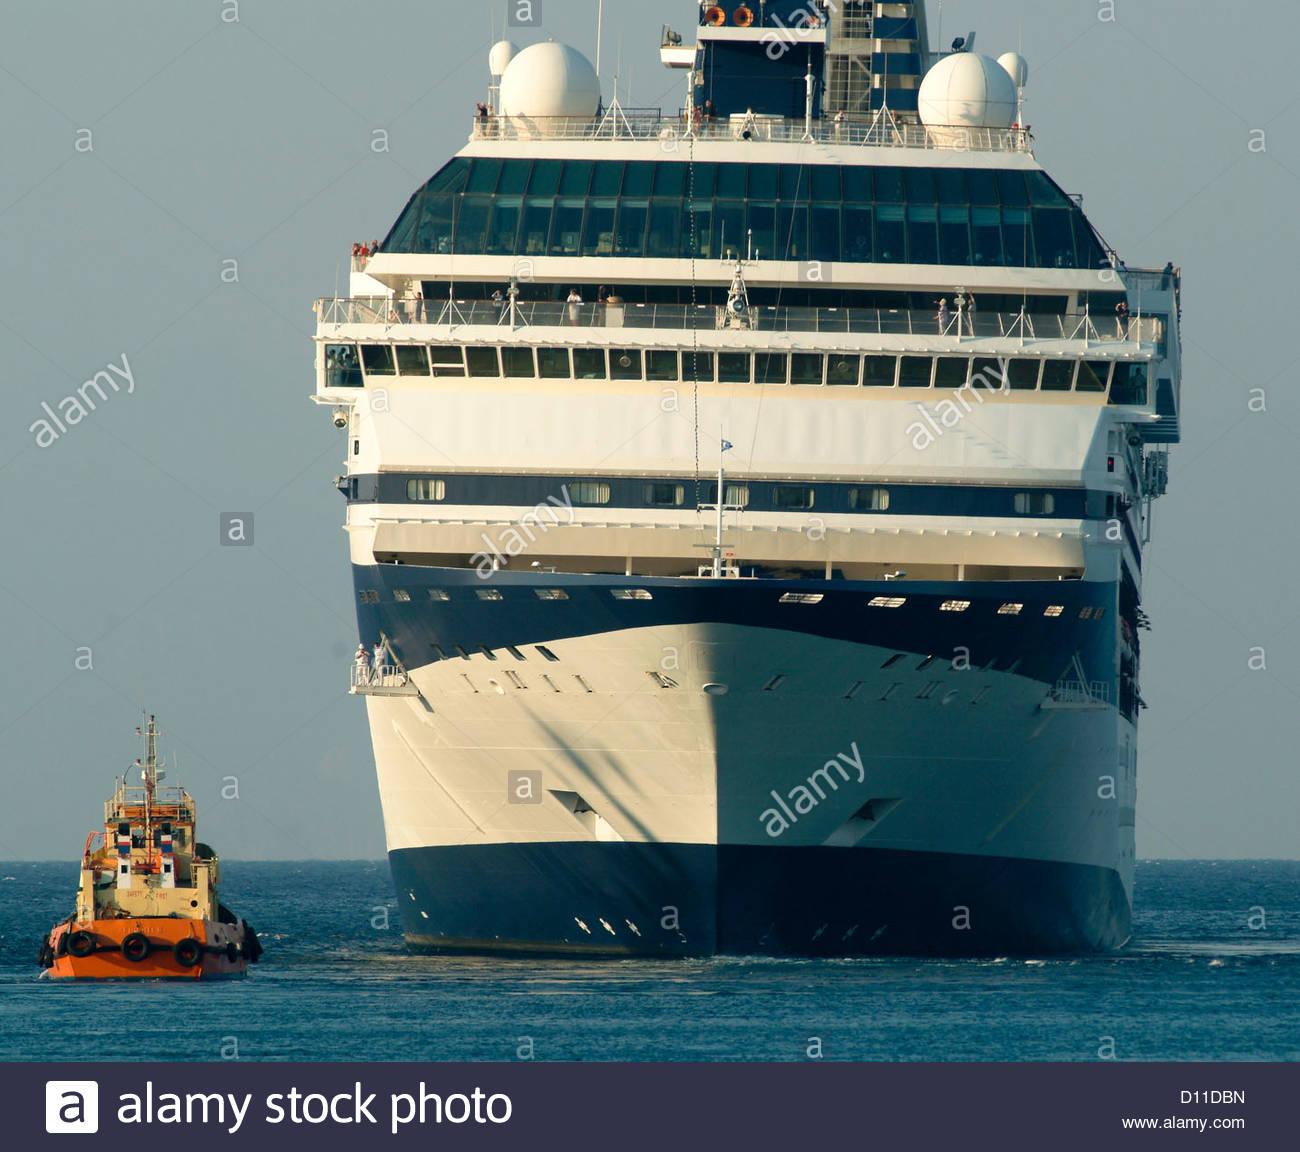 cruise ship size comparison sizes big small huge Stock Photo ...